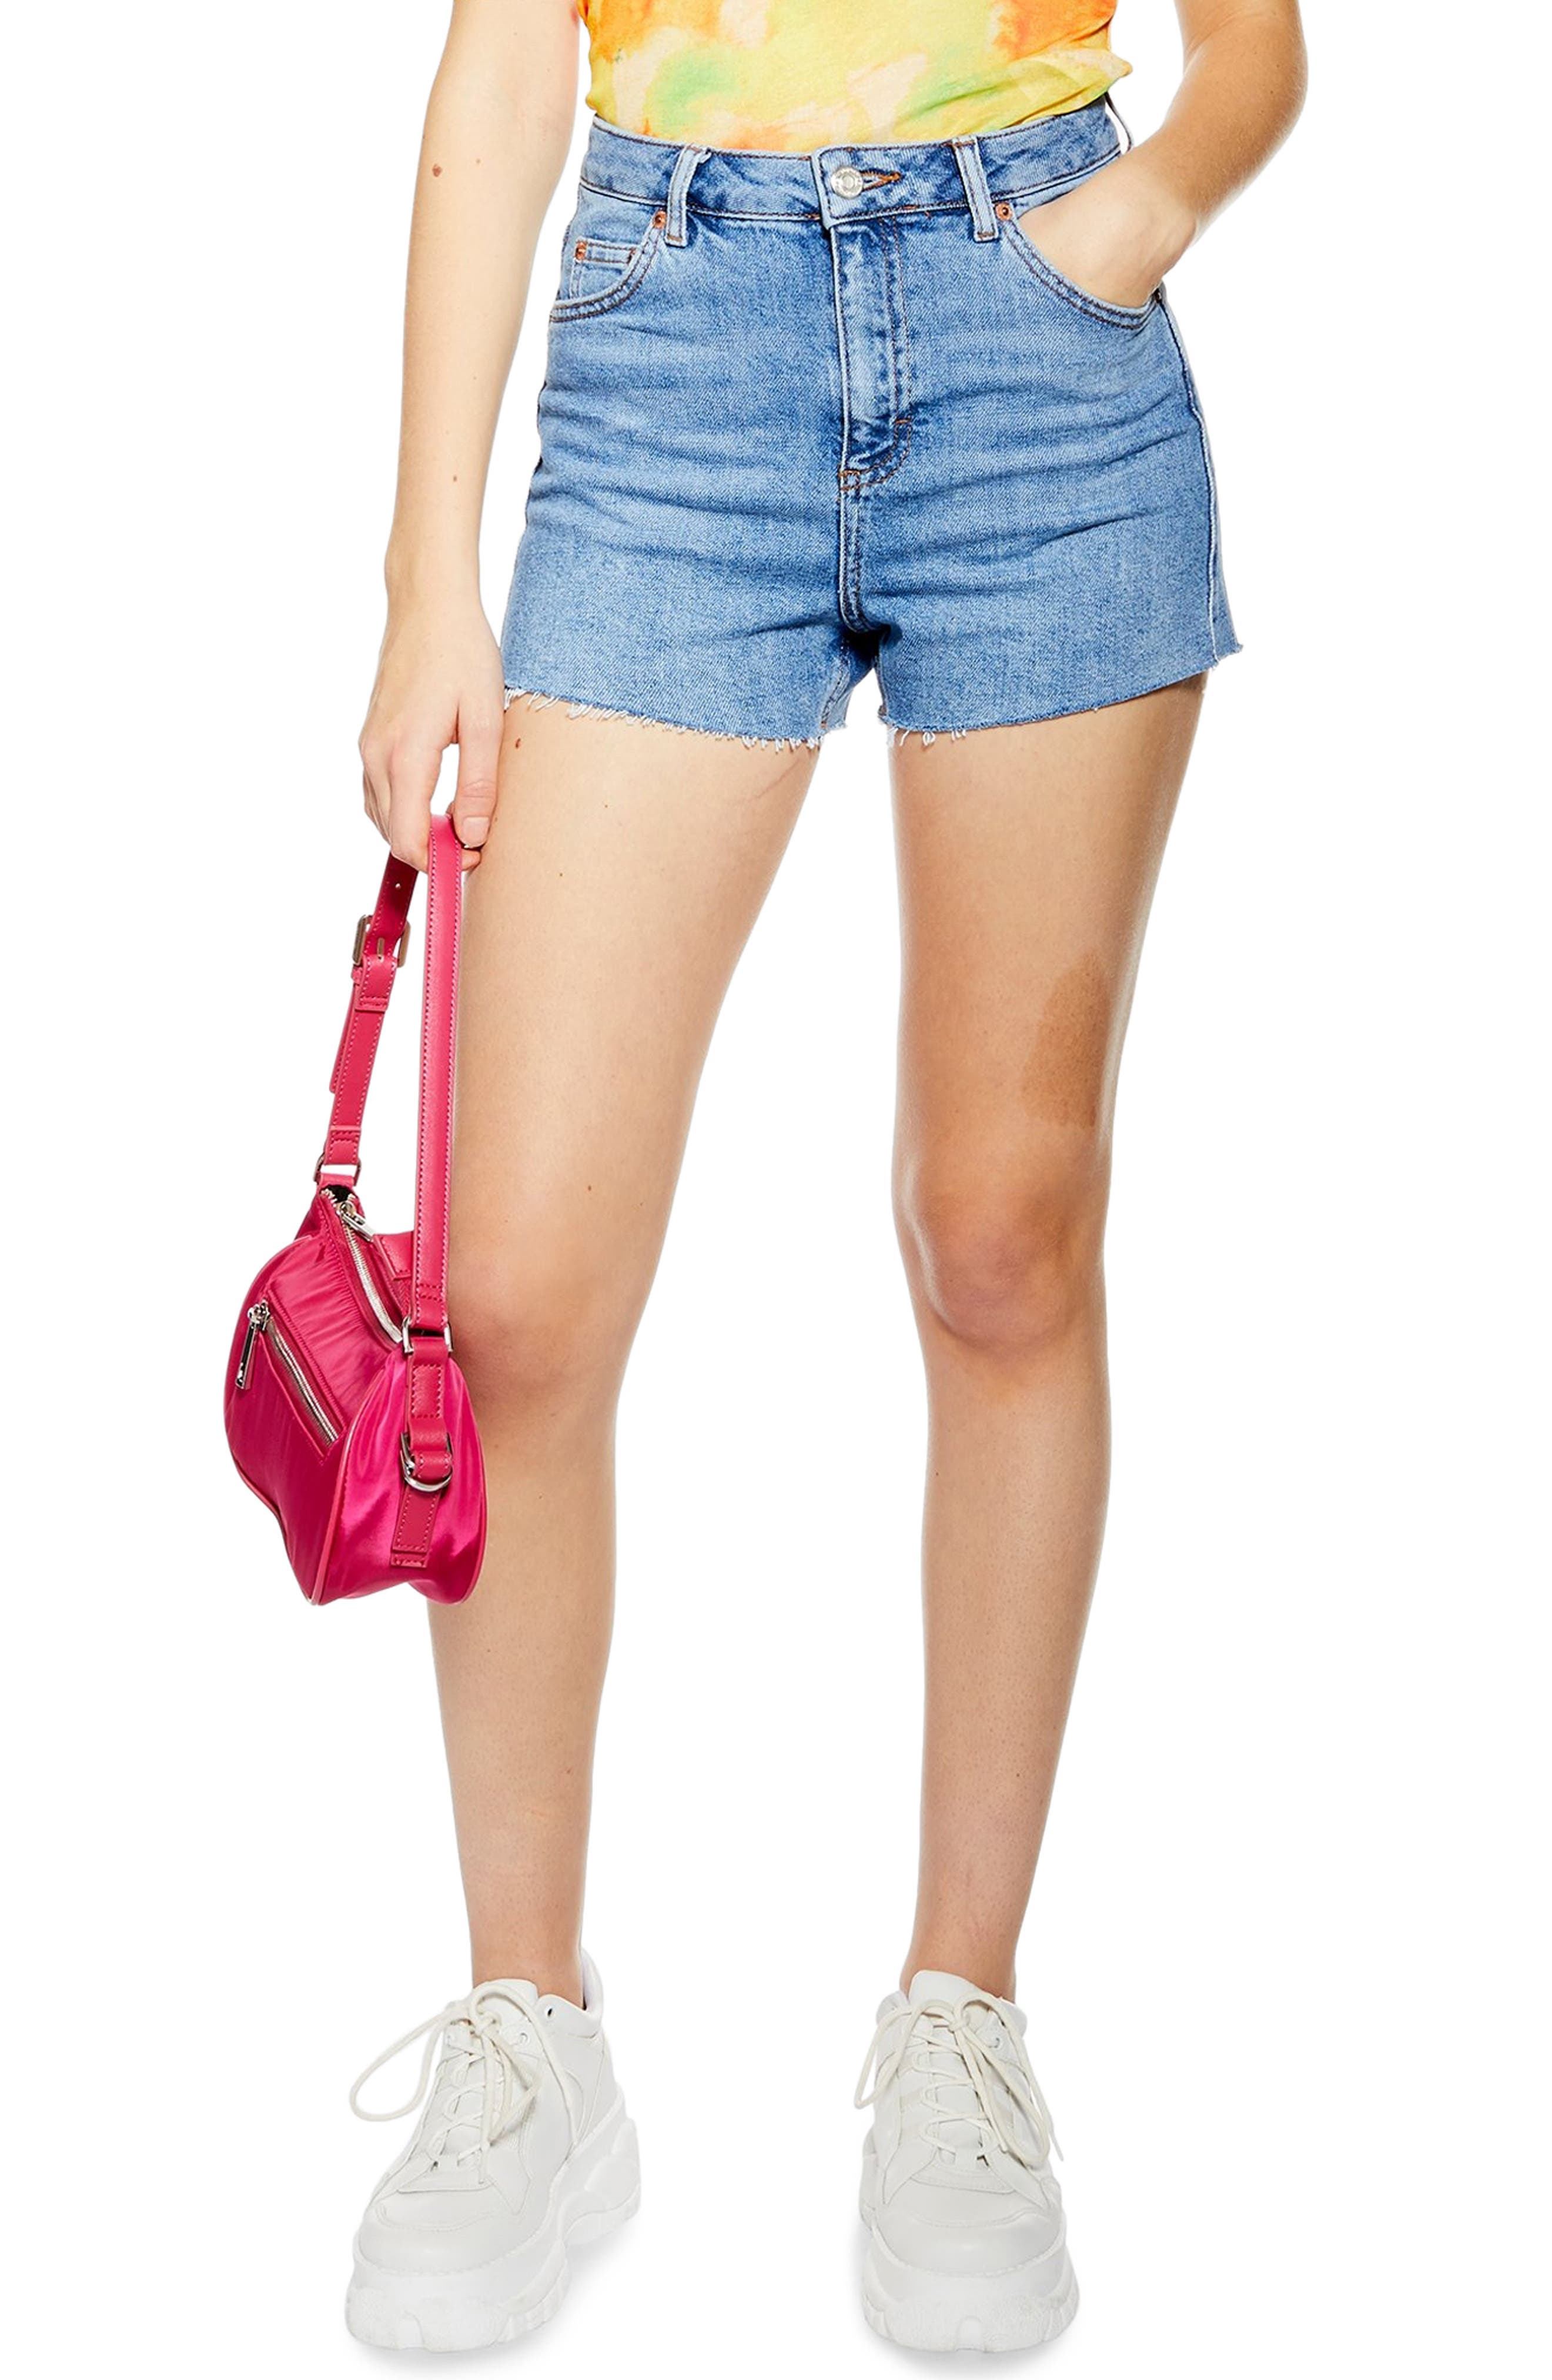 TOPSHOP, Premium Denim Mom Shorts, Main thumbnail 1, color, MID DENIM